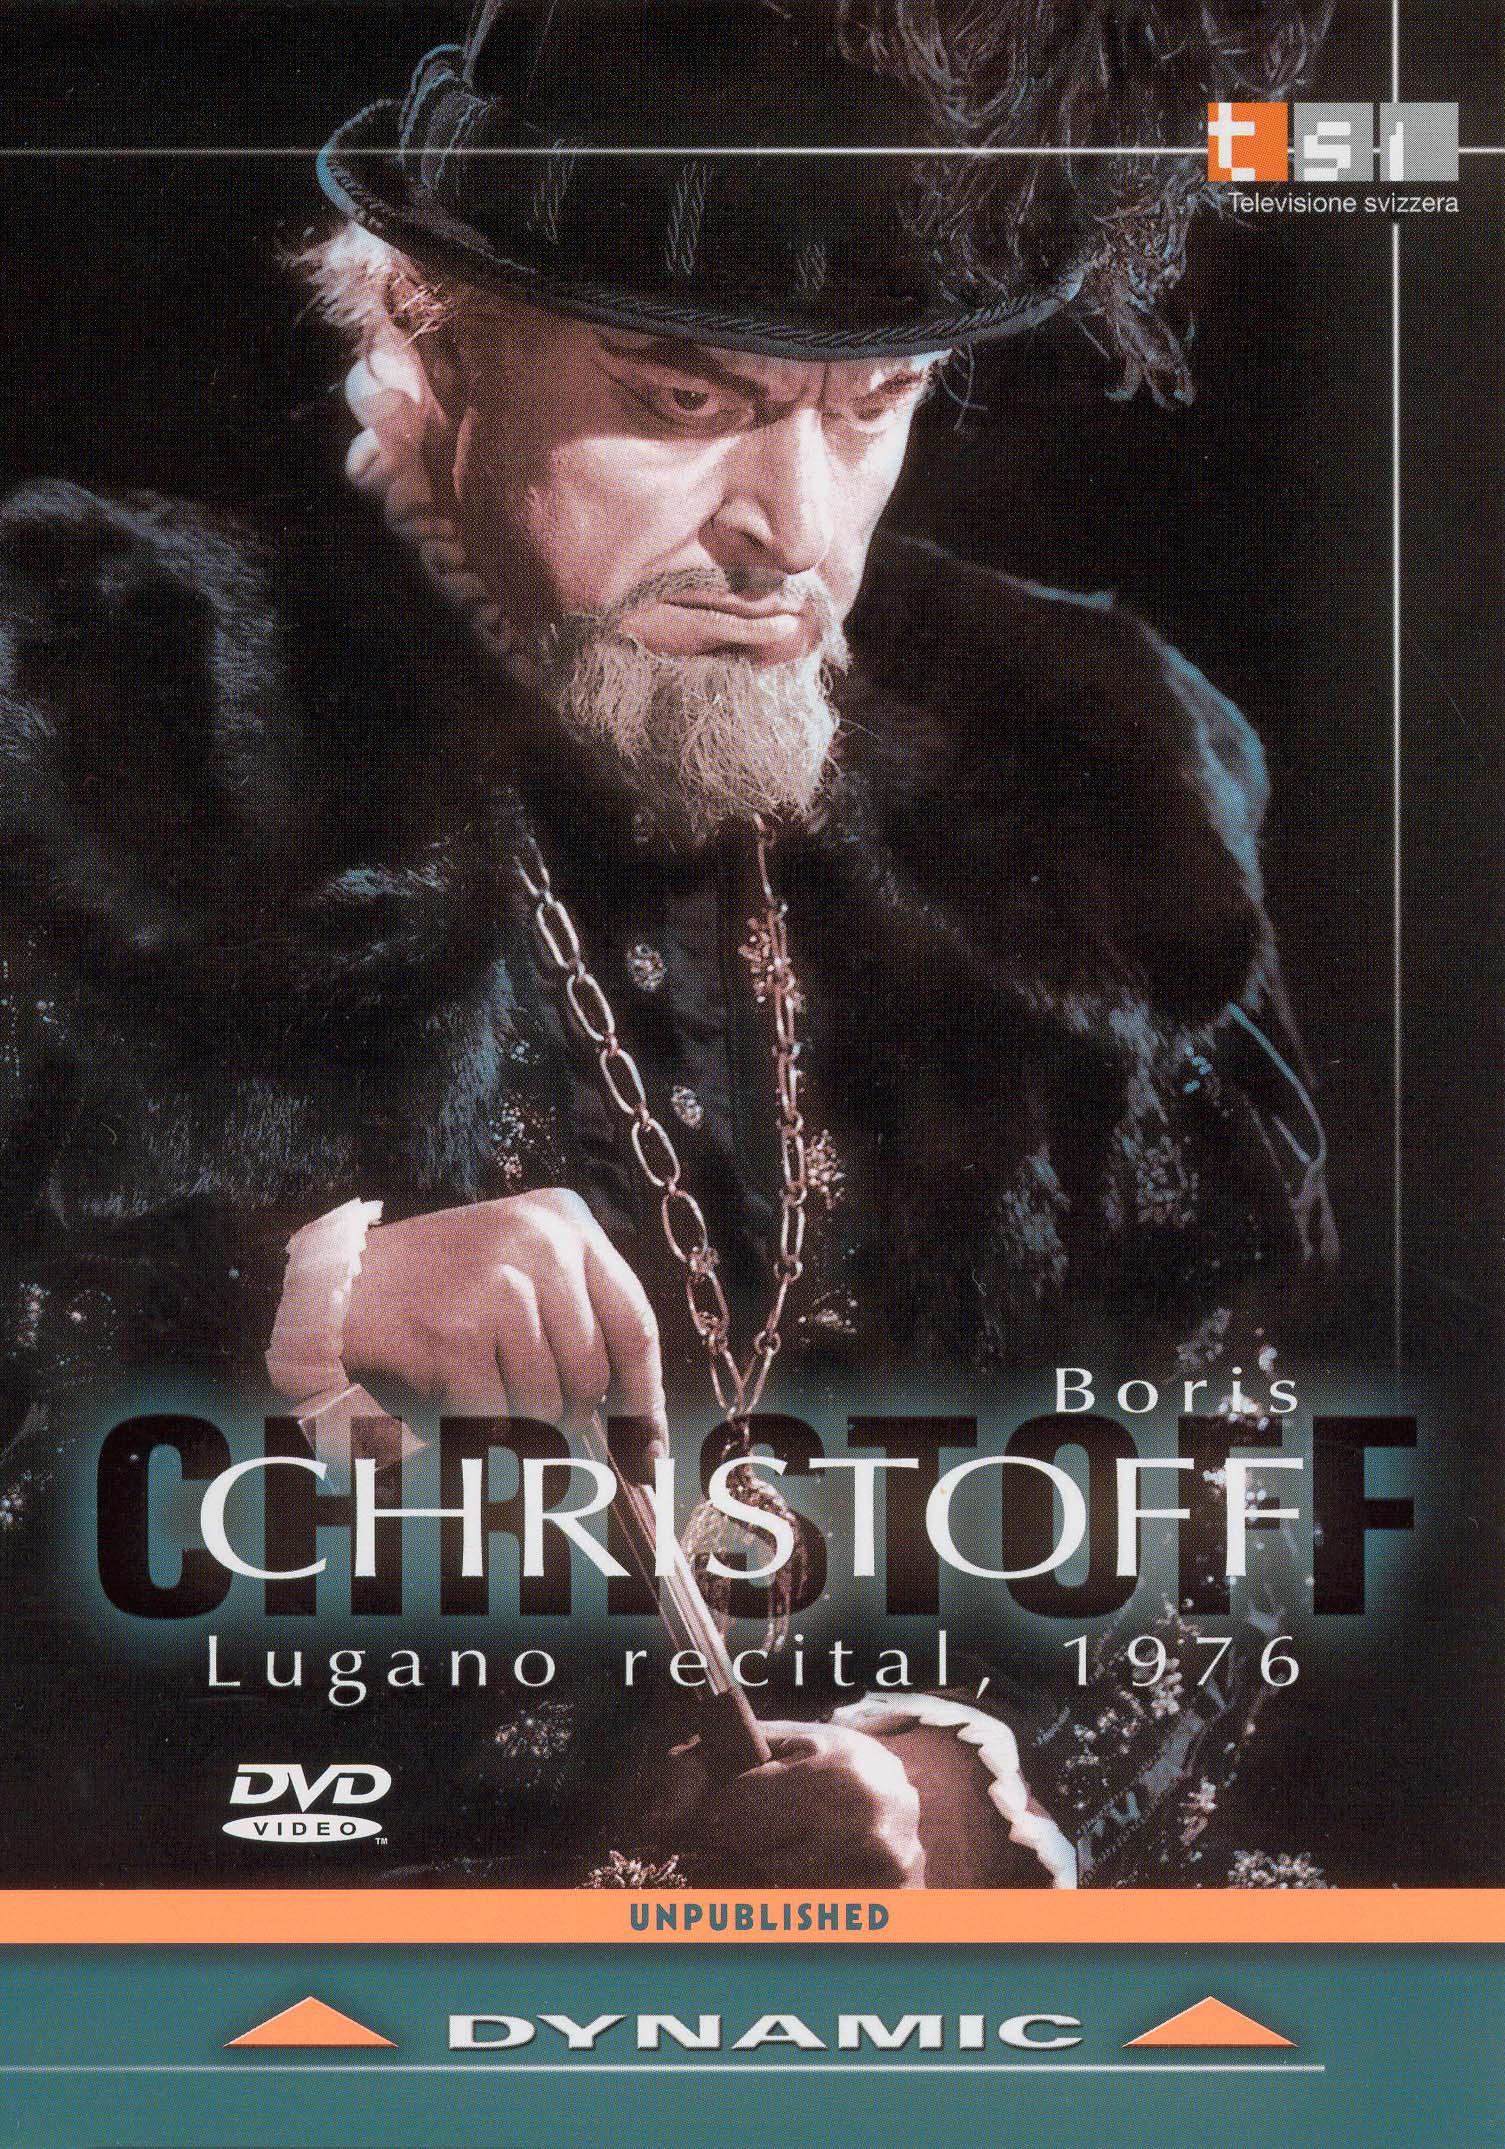 Christoff Boris: Lugano Recital 1976